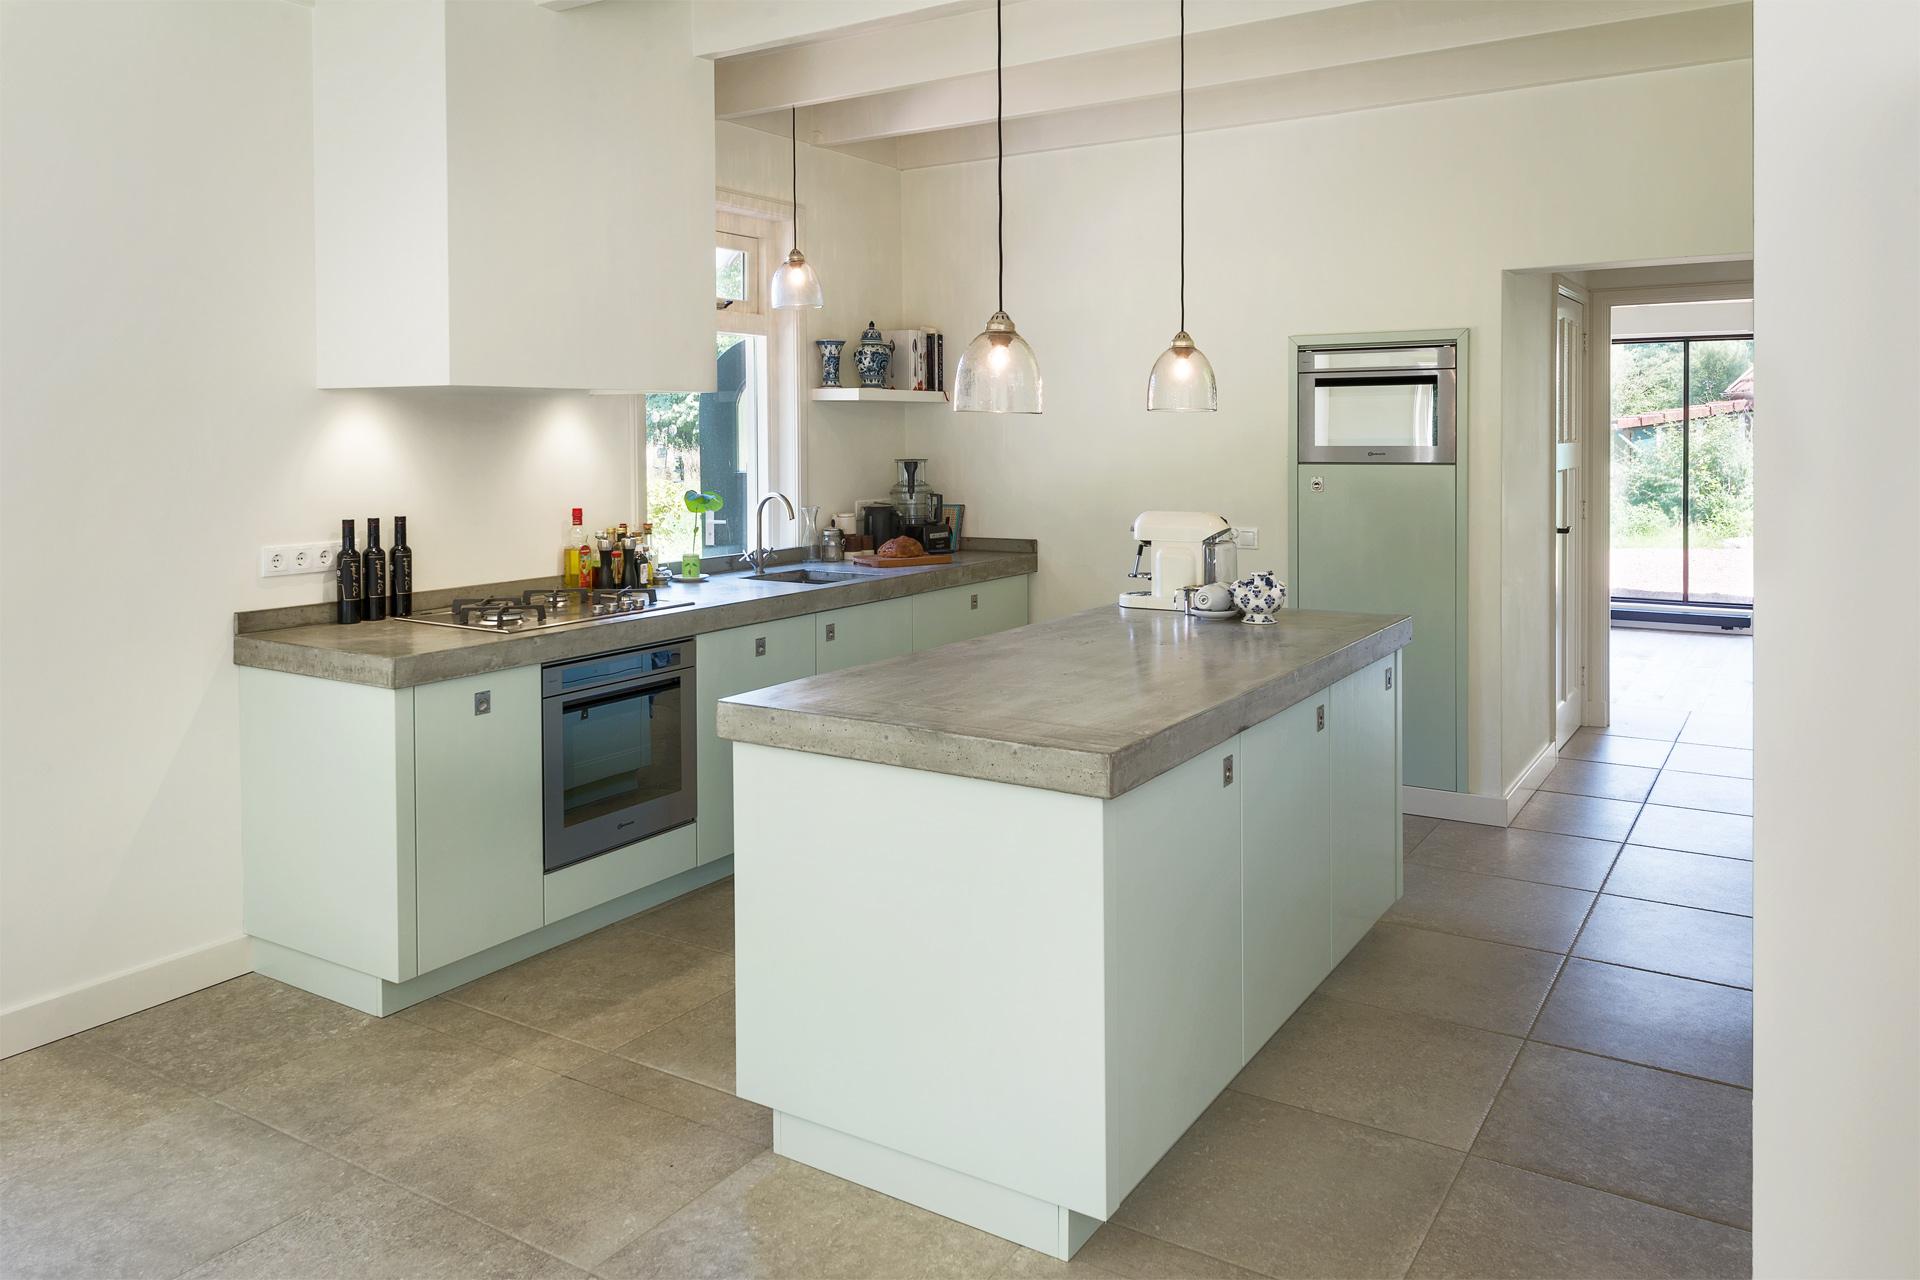 Werkplek Keuken Inrichten : Werkplek aan huis met totaalontwerp erjo maatwerk interieur